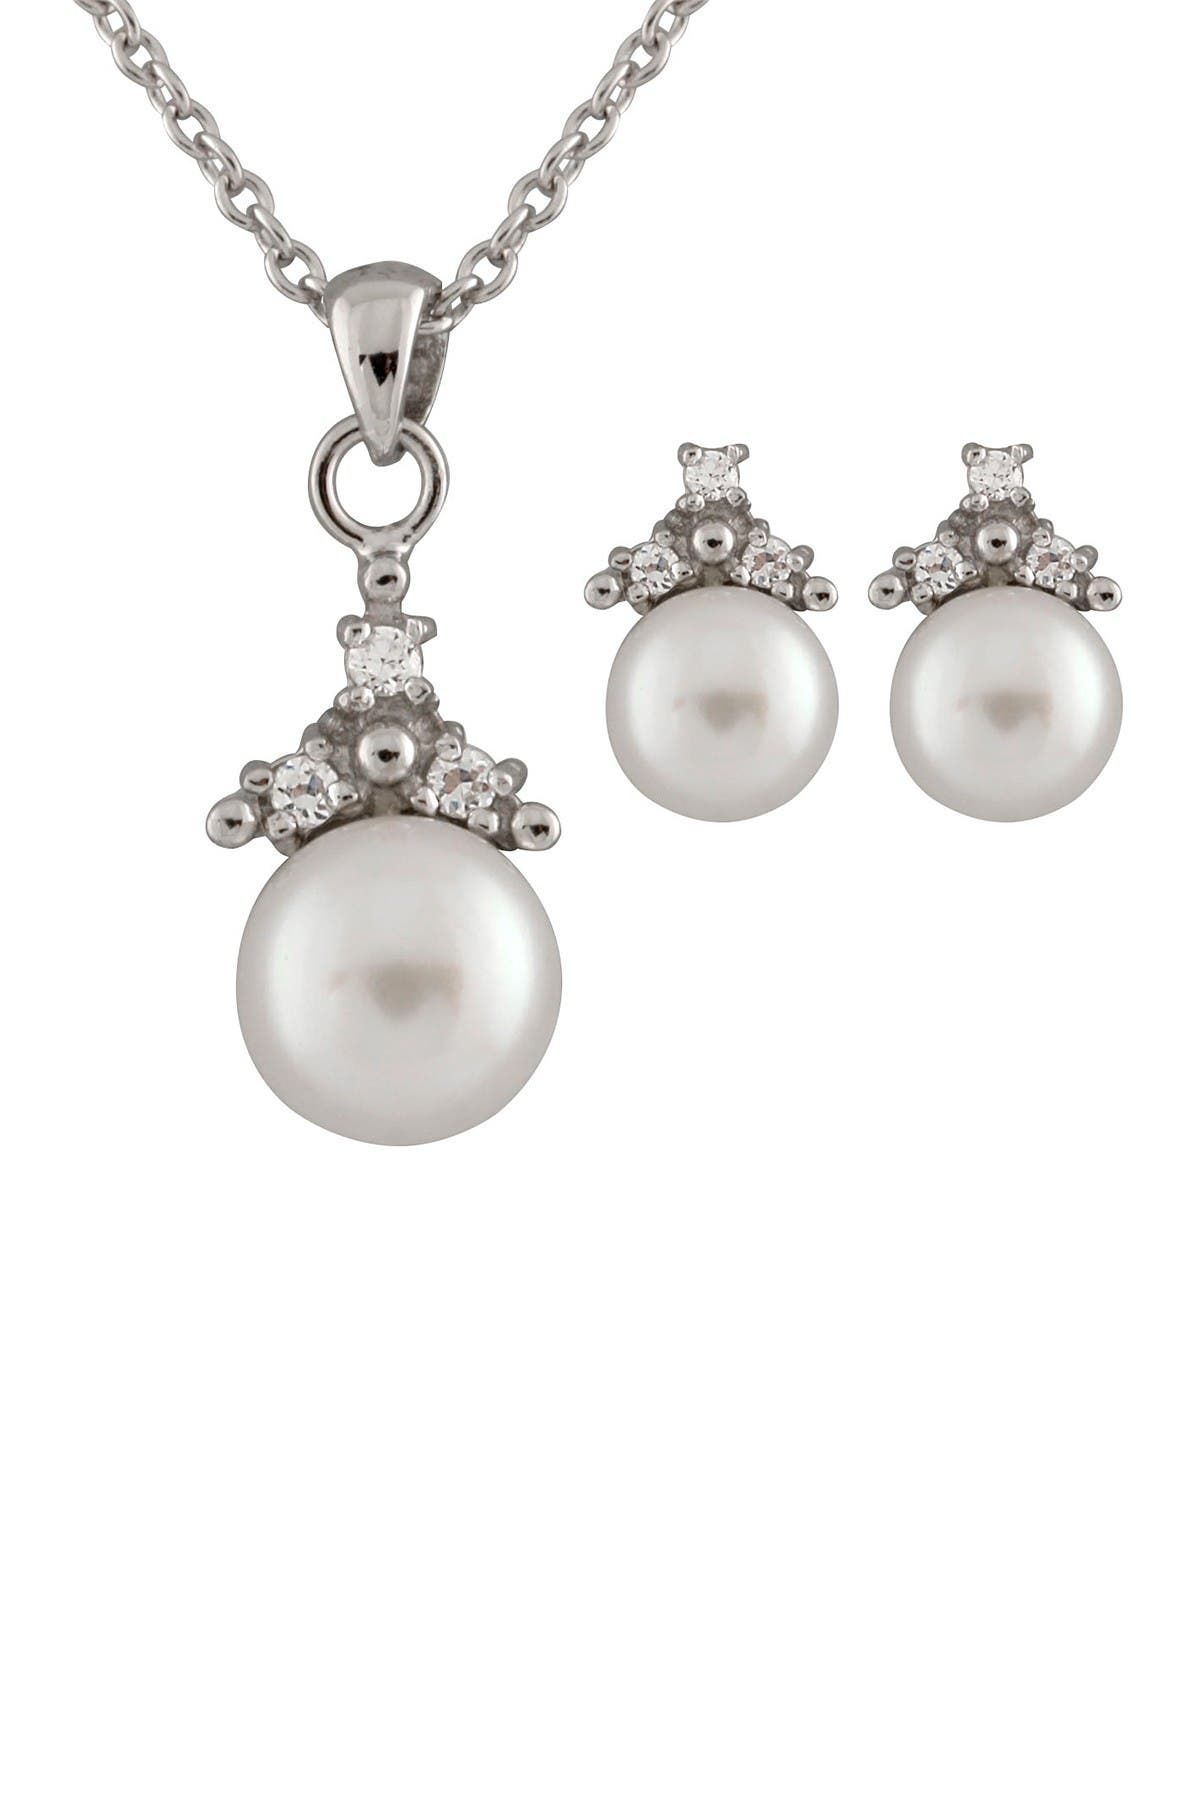 Image of Splendid Pearls 6.5-7mm White Freshwater Pearl & Triple CZ Necklace & Earrings Set